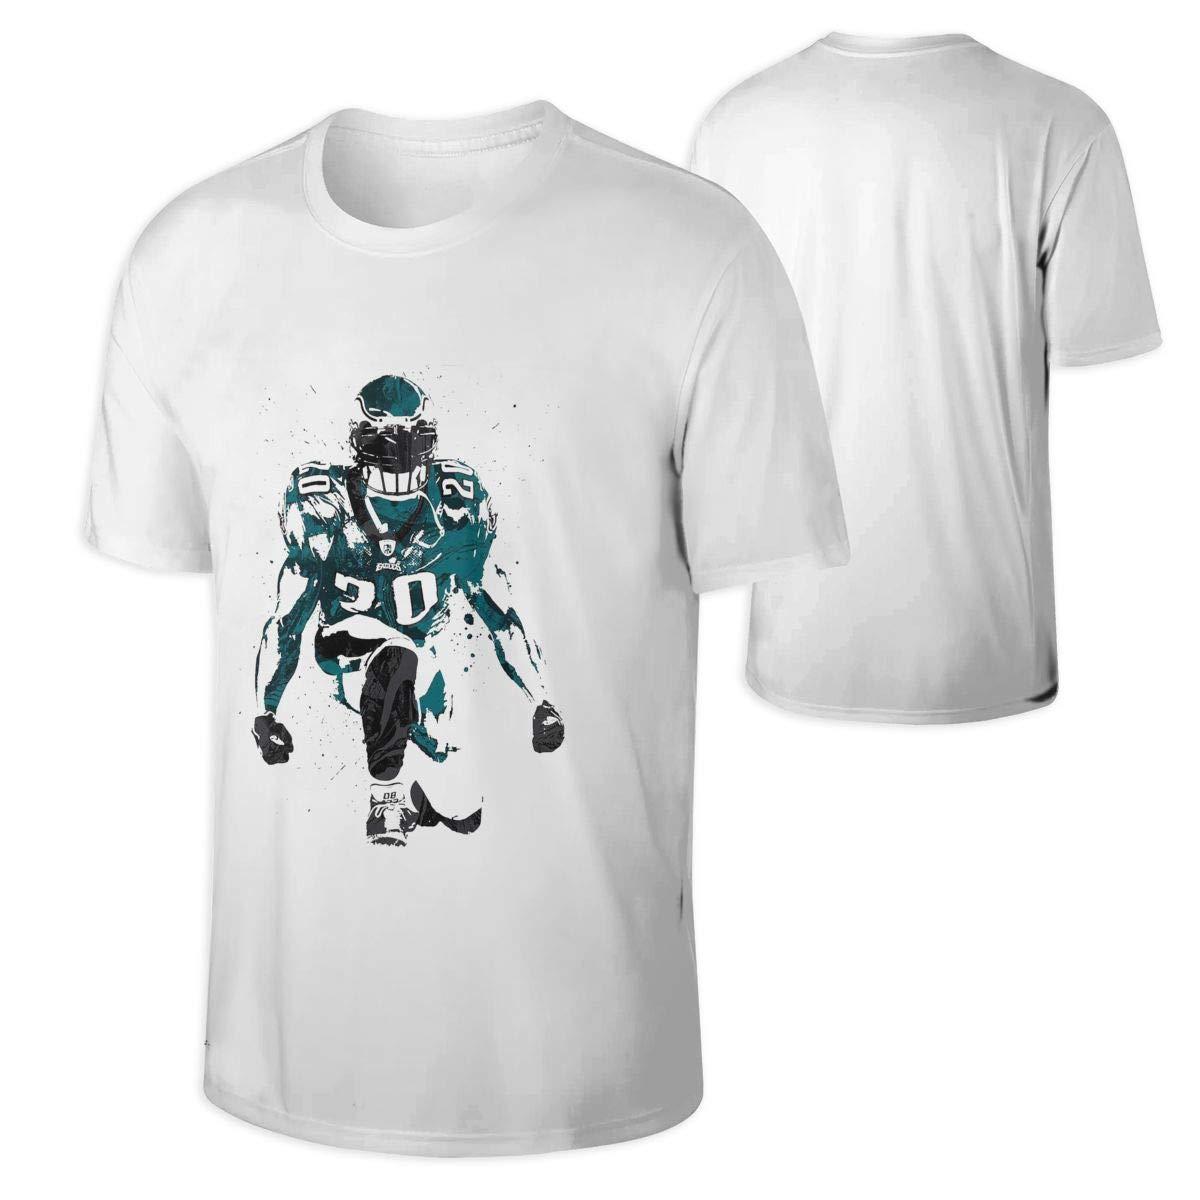 reputable site ce014 3d22c Amazon.com: Brian Dawkins Hall Of Fame Football Man's Tee ...